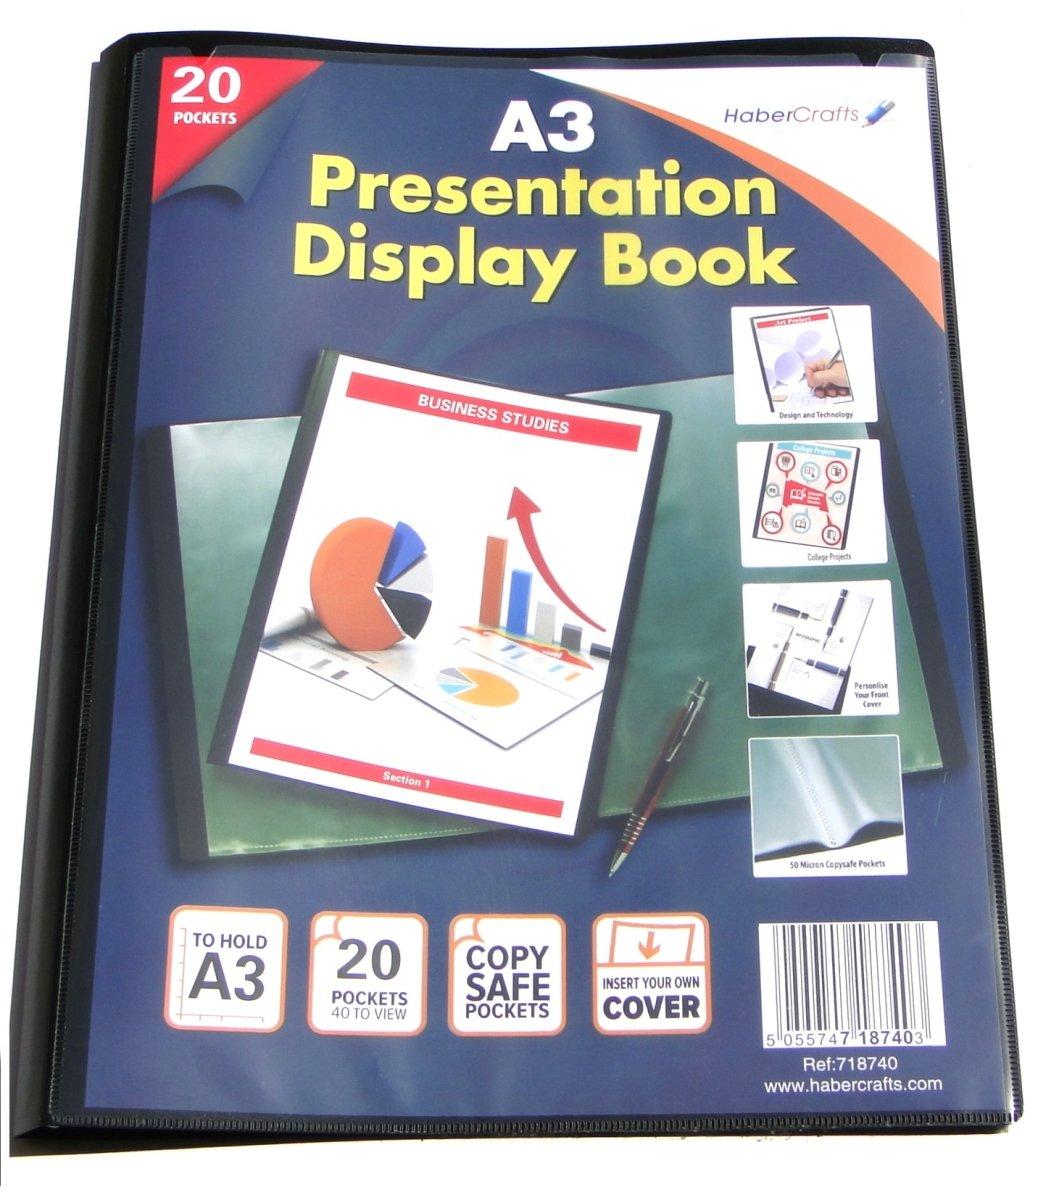 A3 Display Book 20 Pockets (40 Views) Hard Cover Presentation Folder Folio (1 Pack) Habercrafts